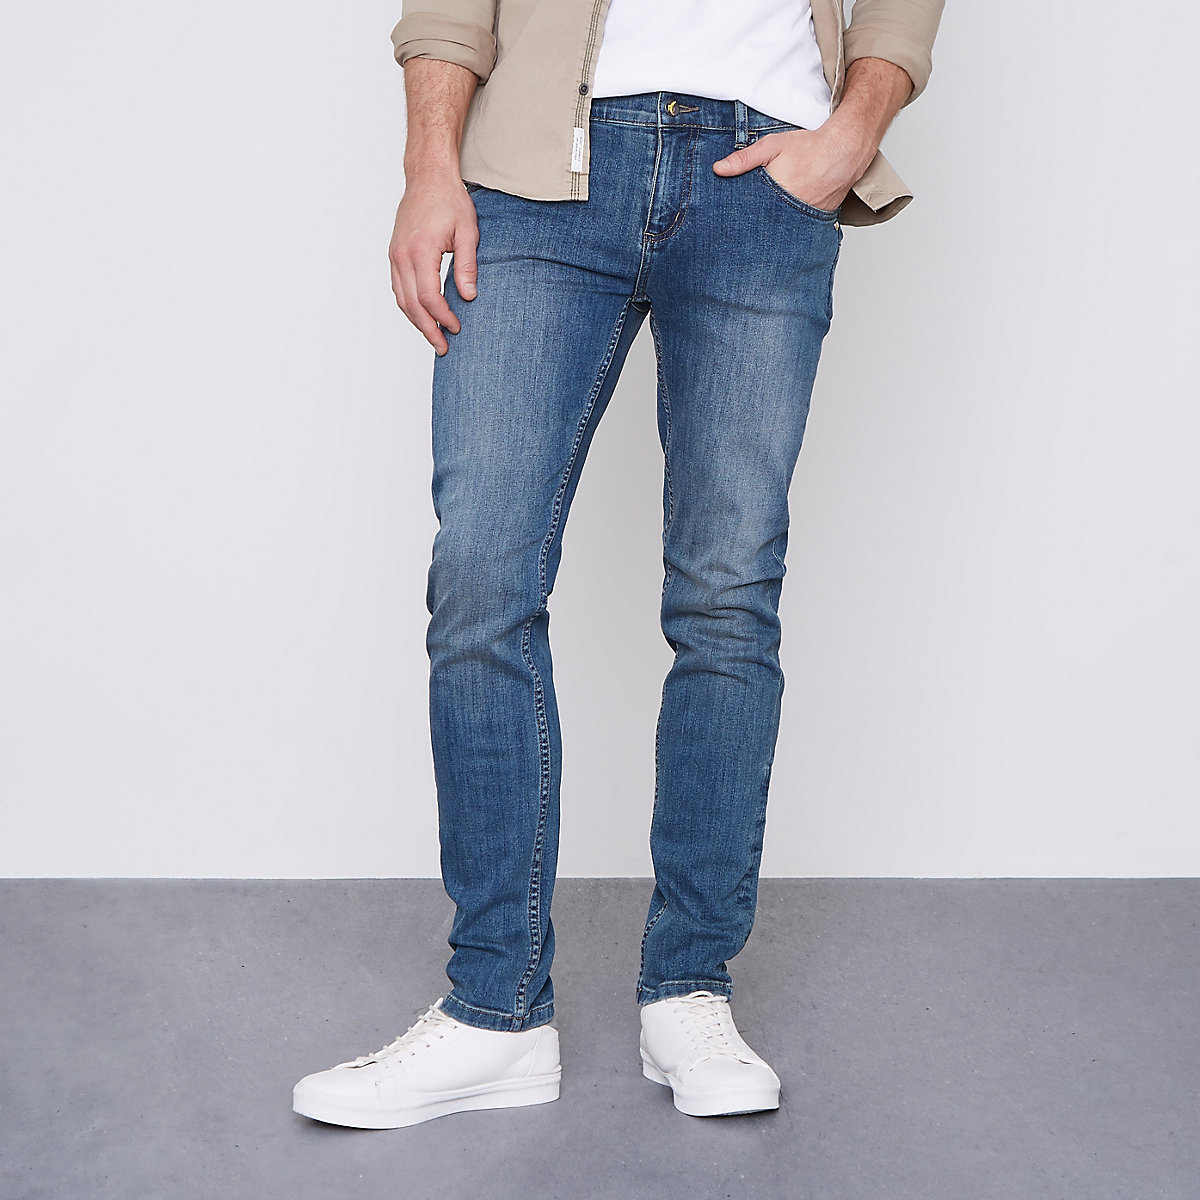 Monkee Genes blue classic skinny jeans